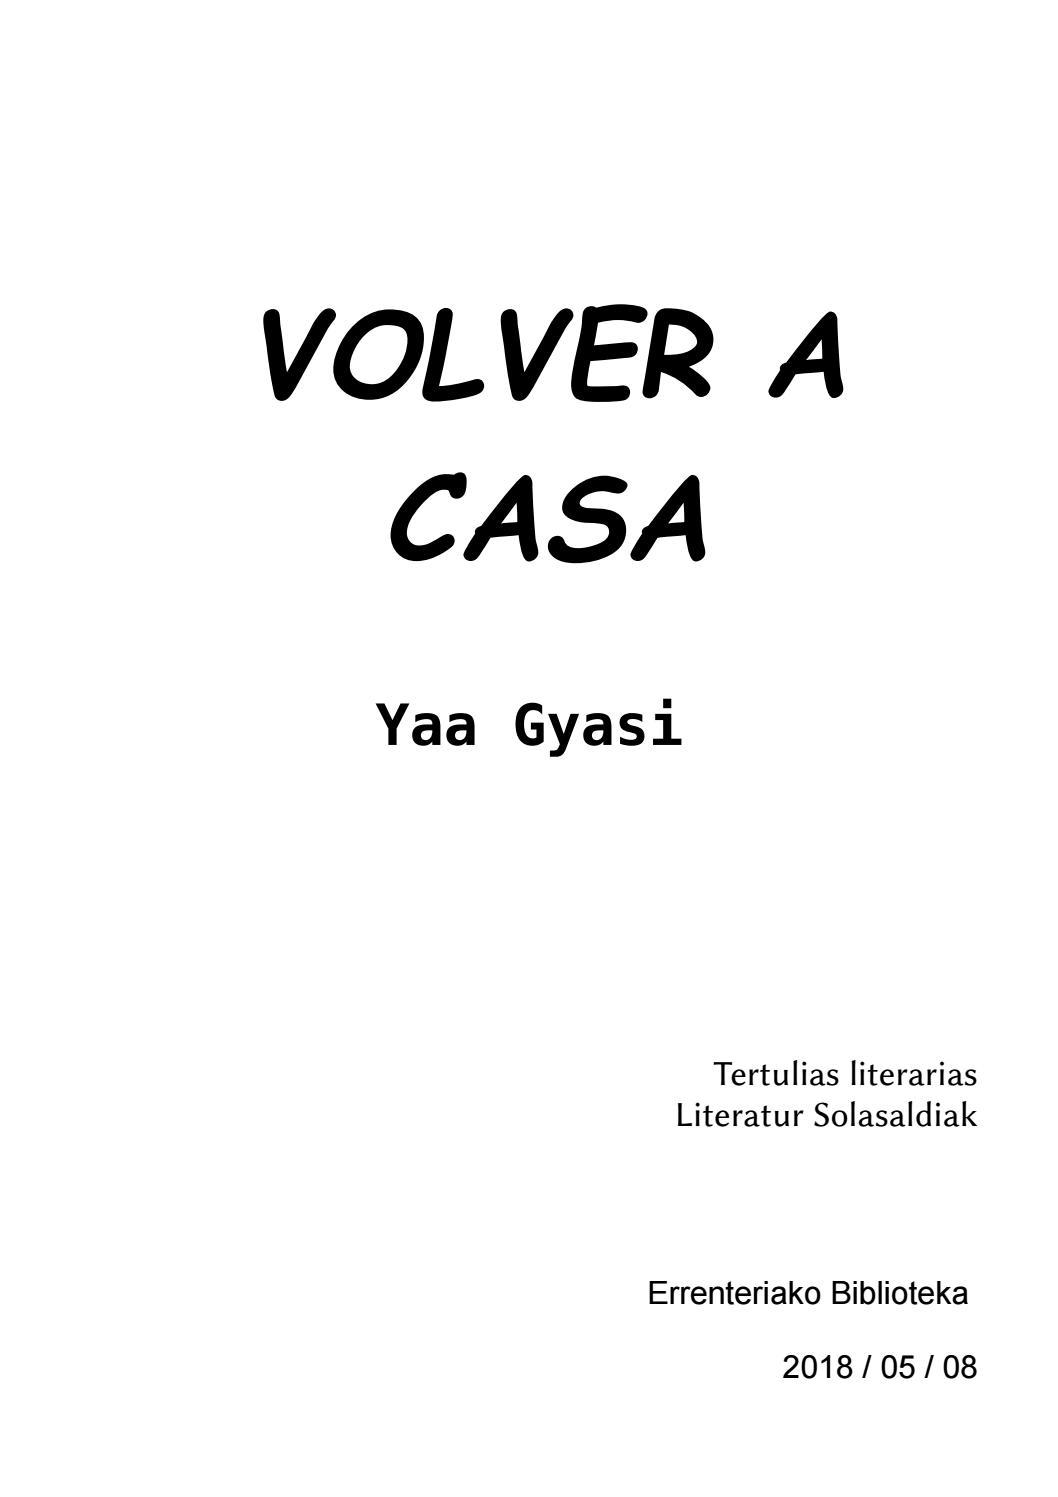 Volver A Casa Yaa Gyasi By Errenteriako Udal Liburutegia Biblioteka Issuu